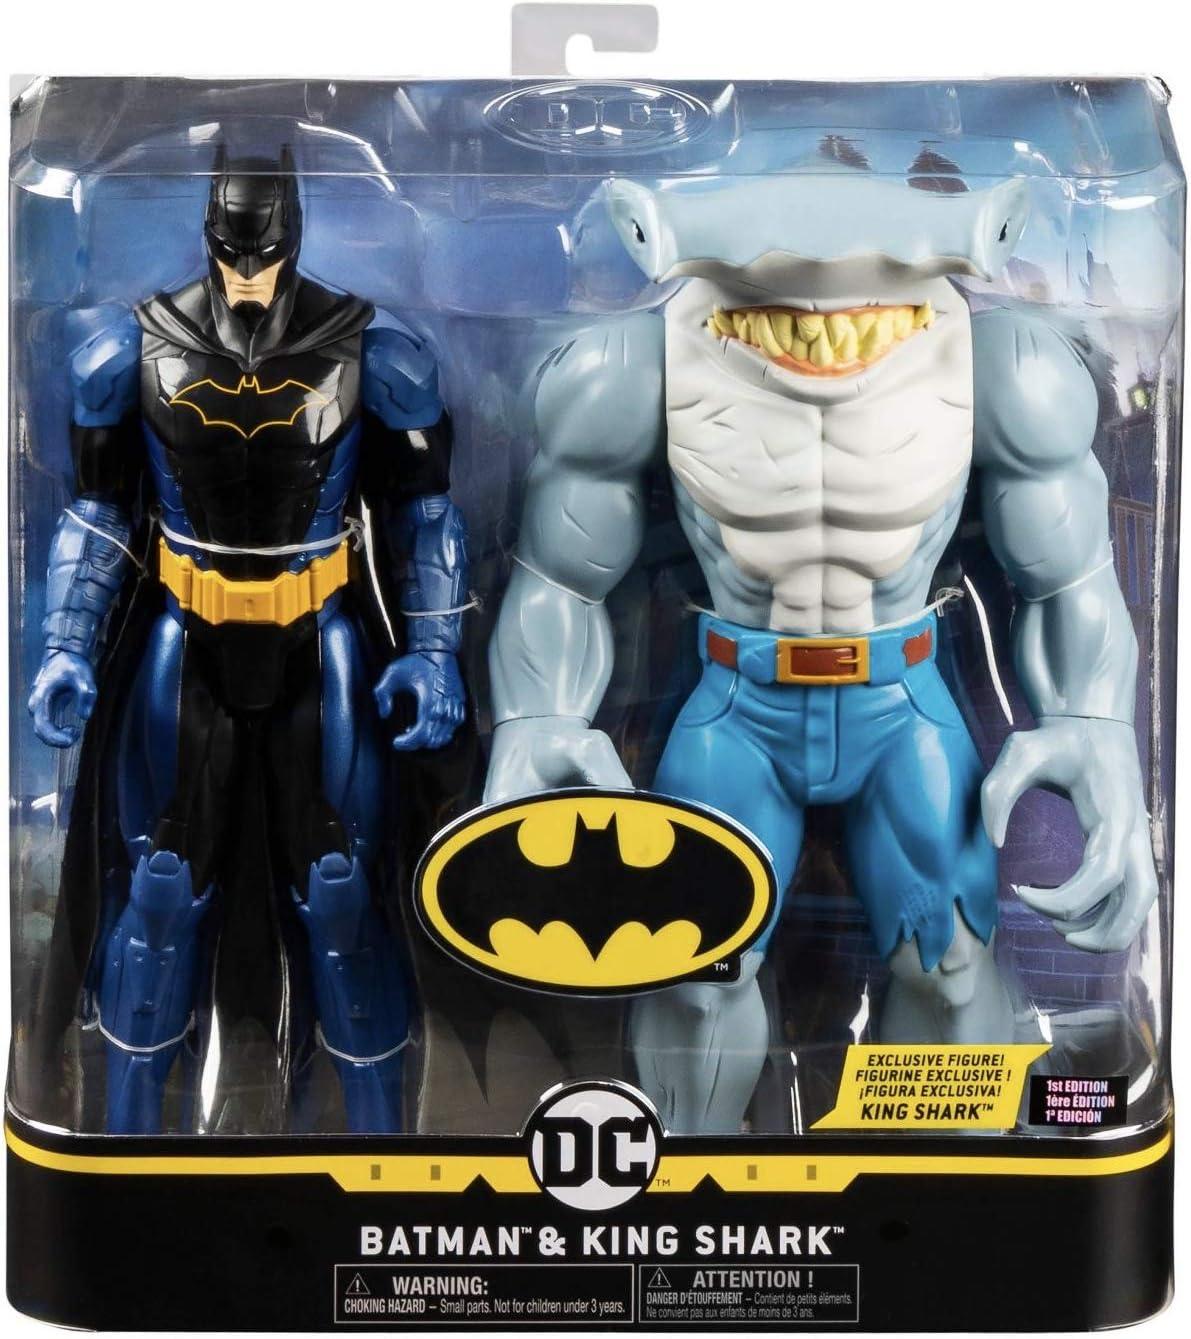 DC Comics Batman and Exclusive King Shark 12 Action Figures Set (1st Edition)